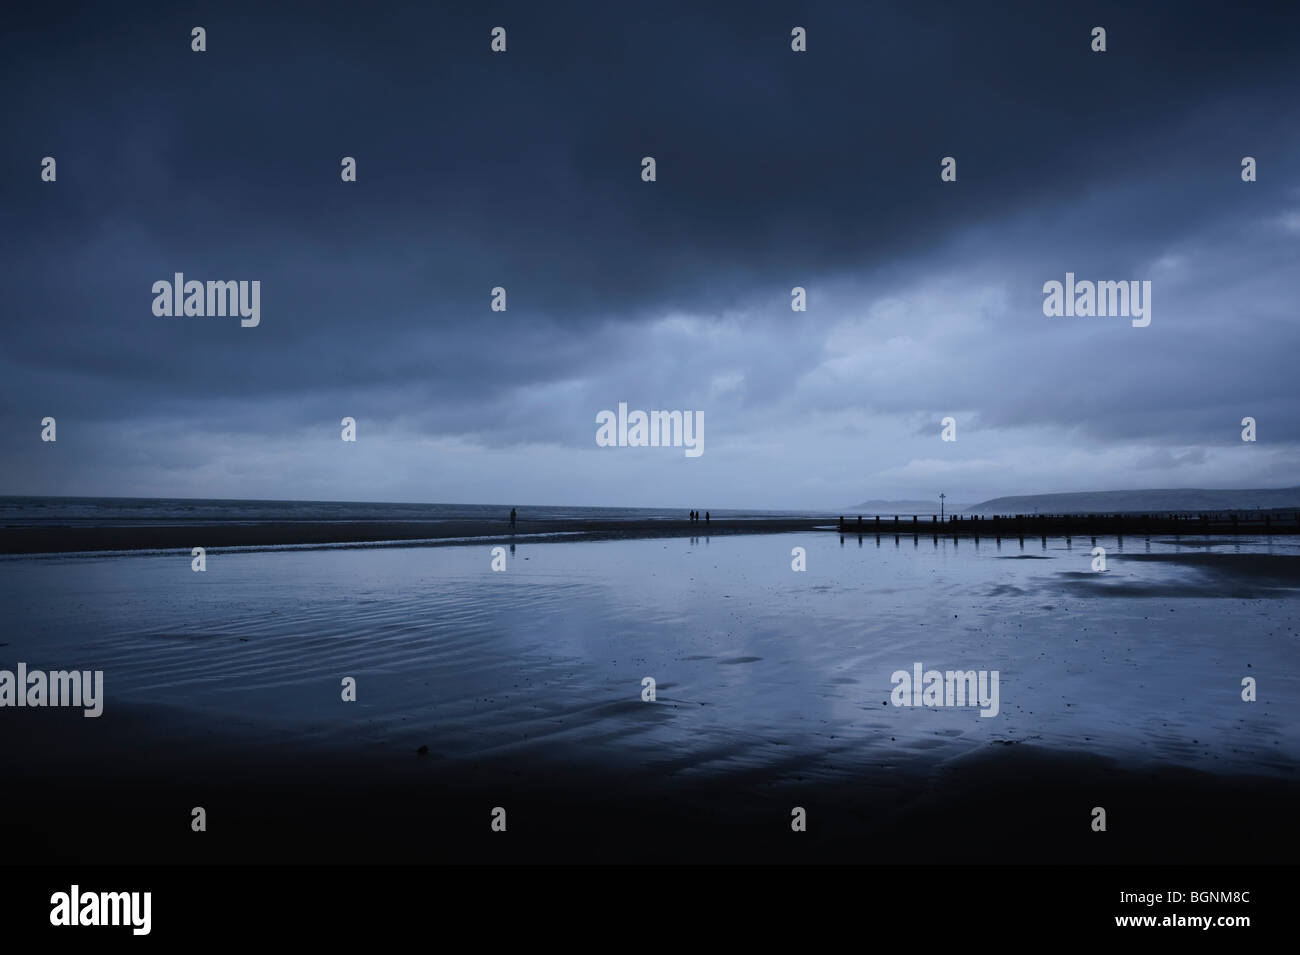 January twilight, beach,overcast, cloudy, grey, evening, stormy, brooding sky, Borth, ceredigion wales UK - Stock Image